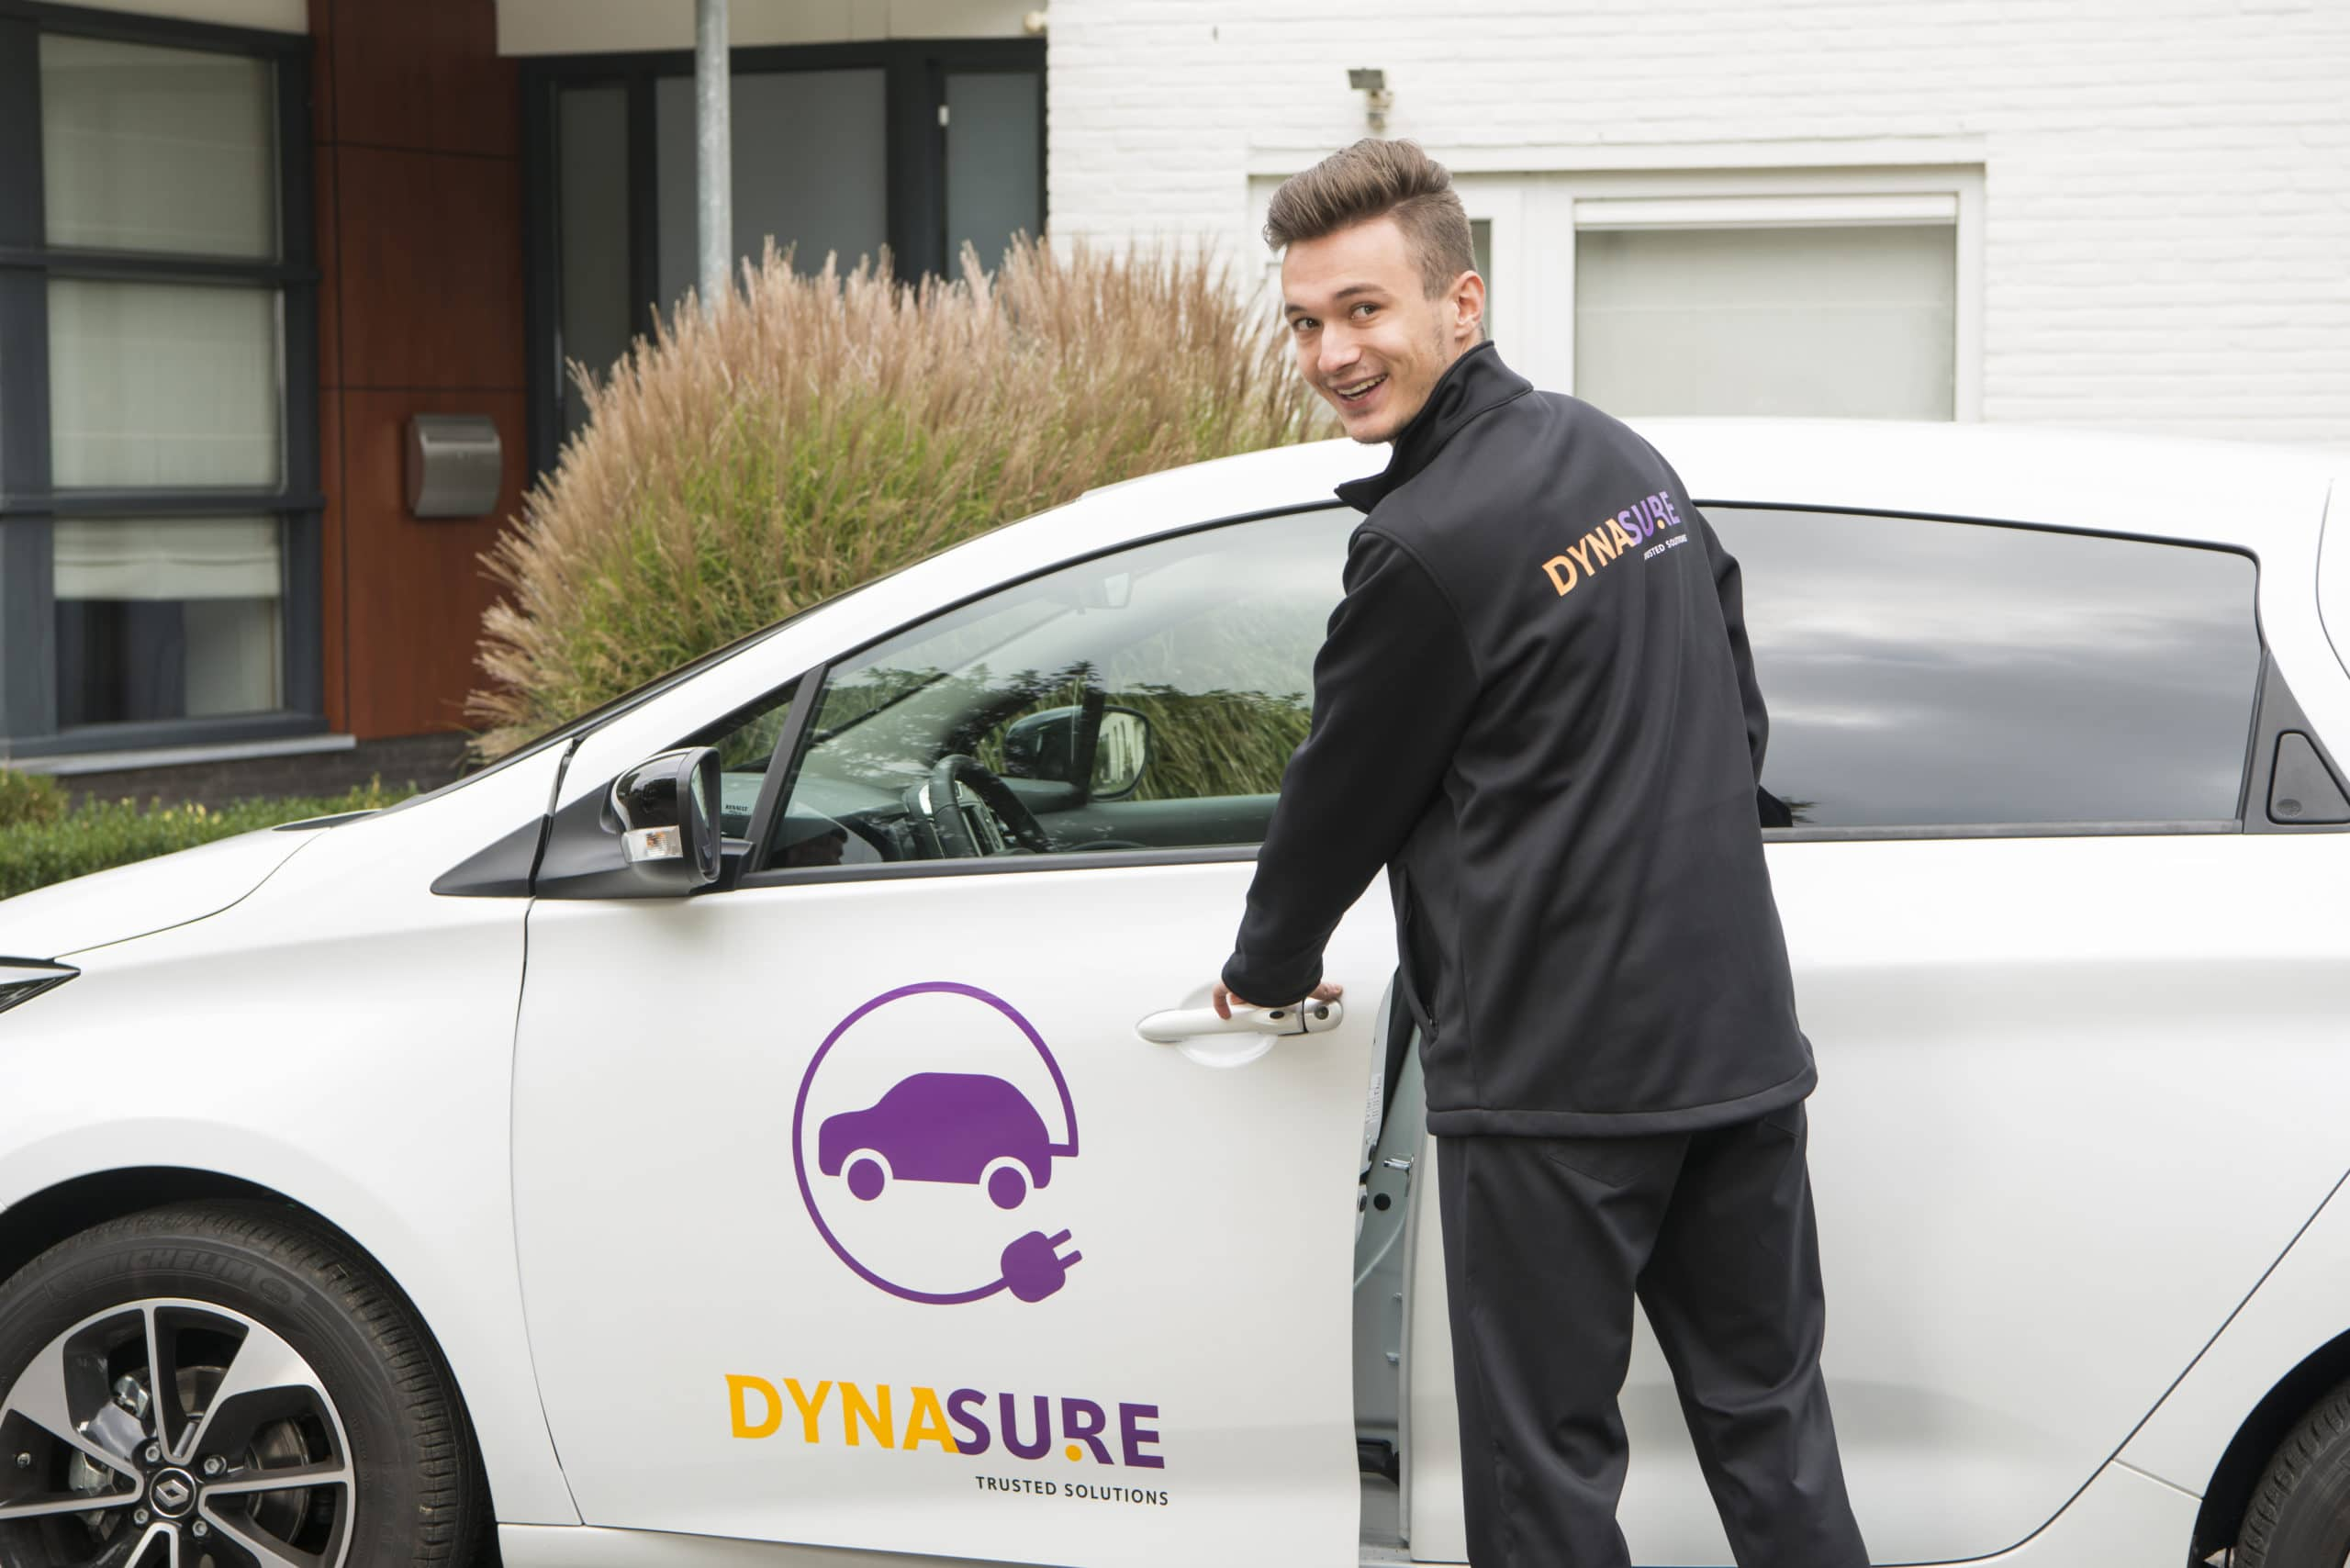 dynasure-bedrijfskleding-suit-up-5